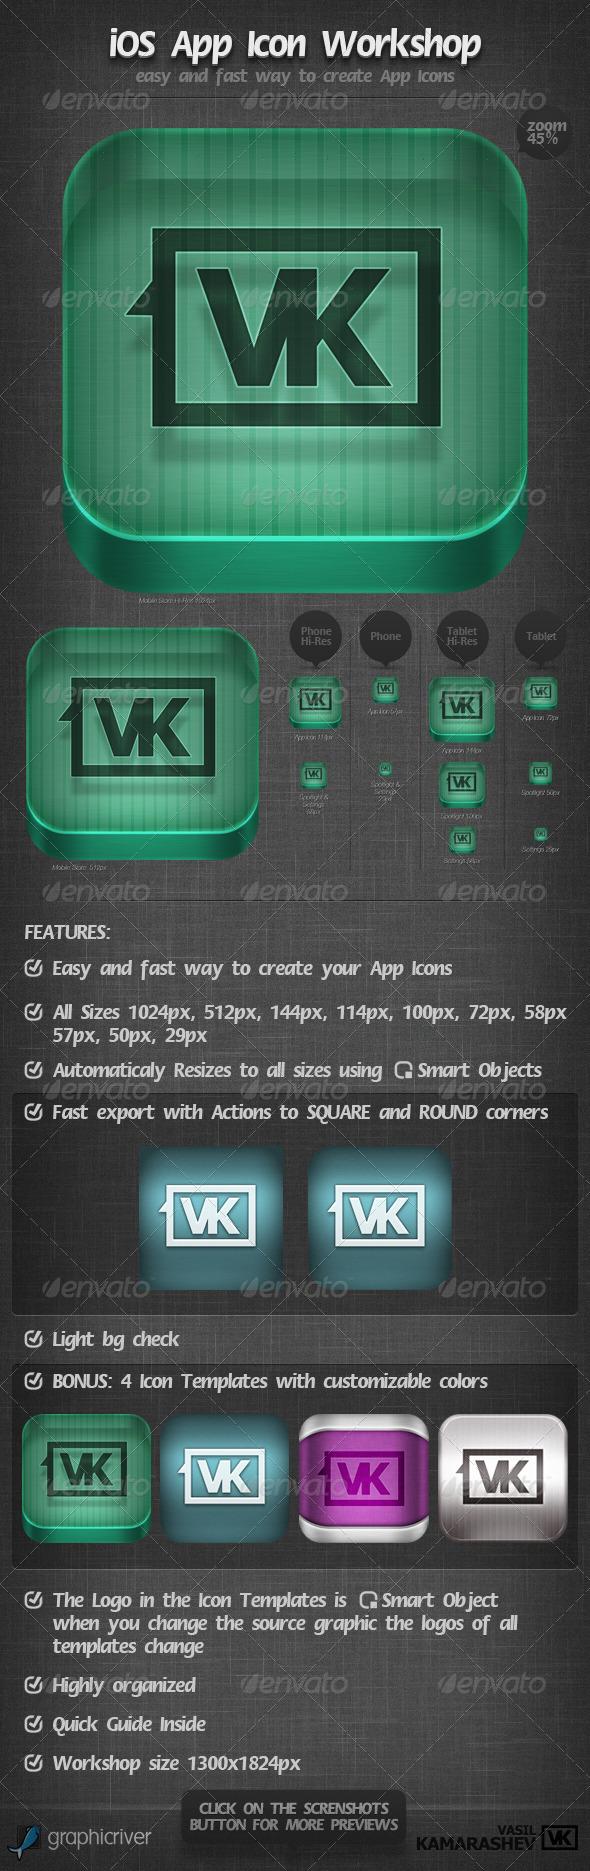 GraphicRiver iOS App Icon Workshop 2287378